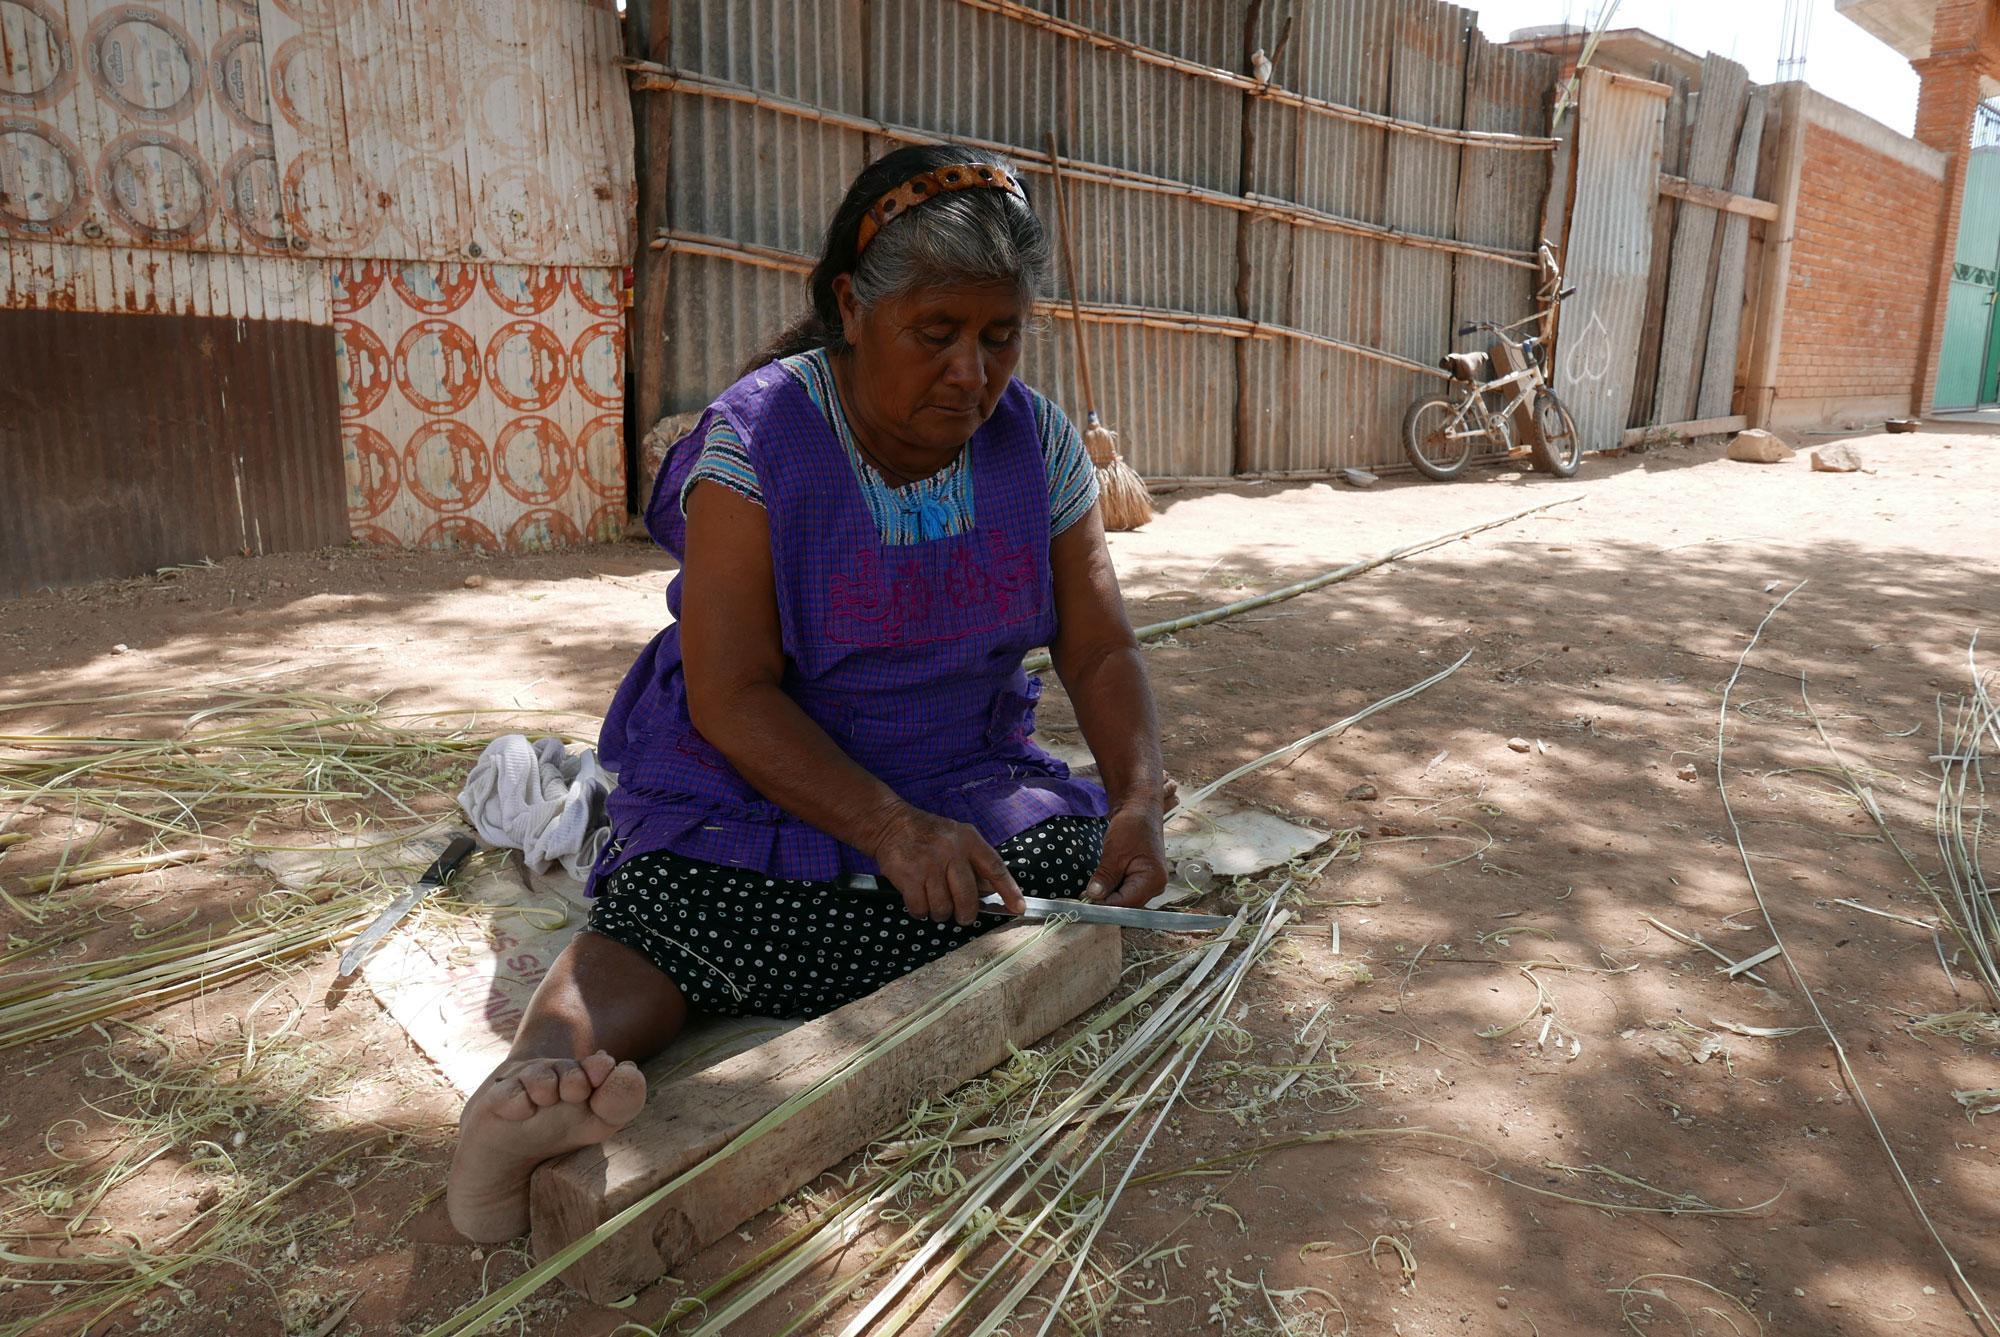 Artisan Cutting Carrizo Reeds Ready for Weaving Baskets in Oaxaca Mexico - www.nidocollective.com/carrizoweaving #carrizo #canastascarrizo #basketweaving